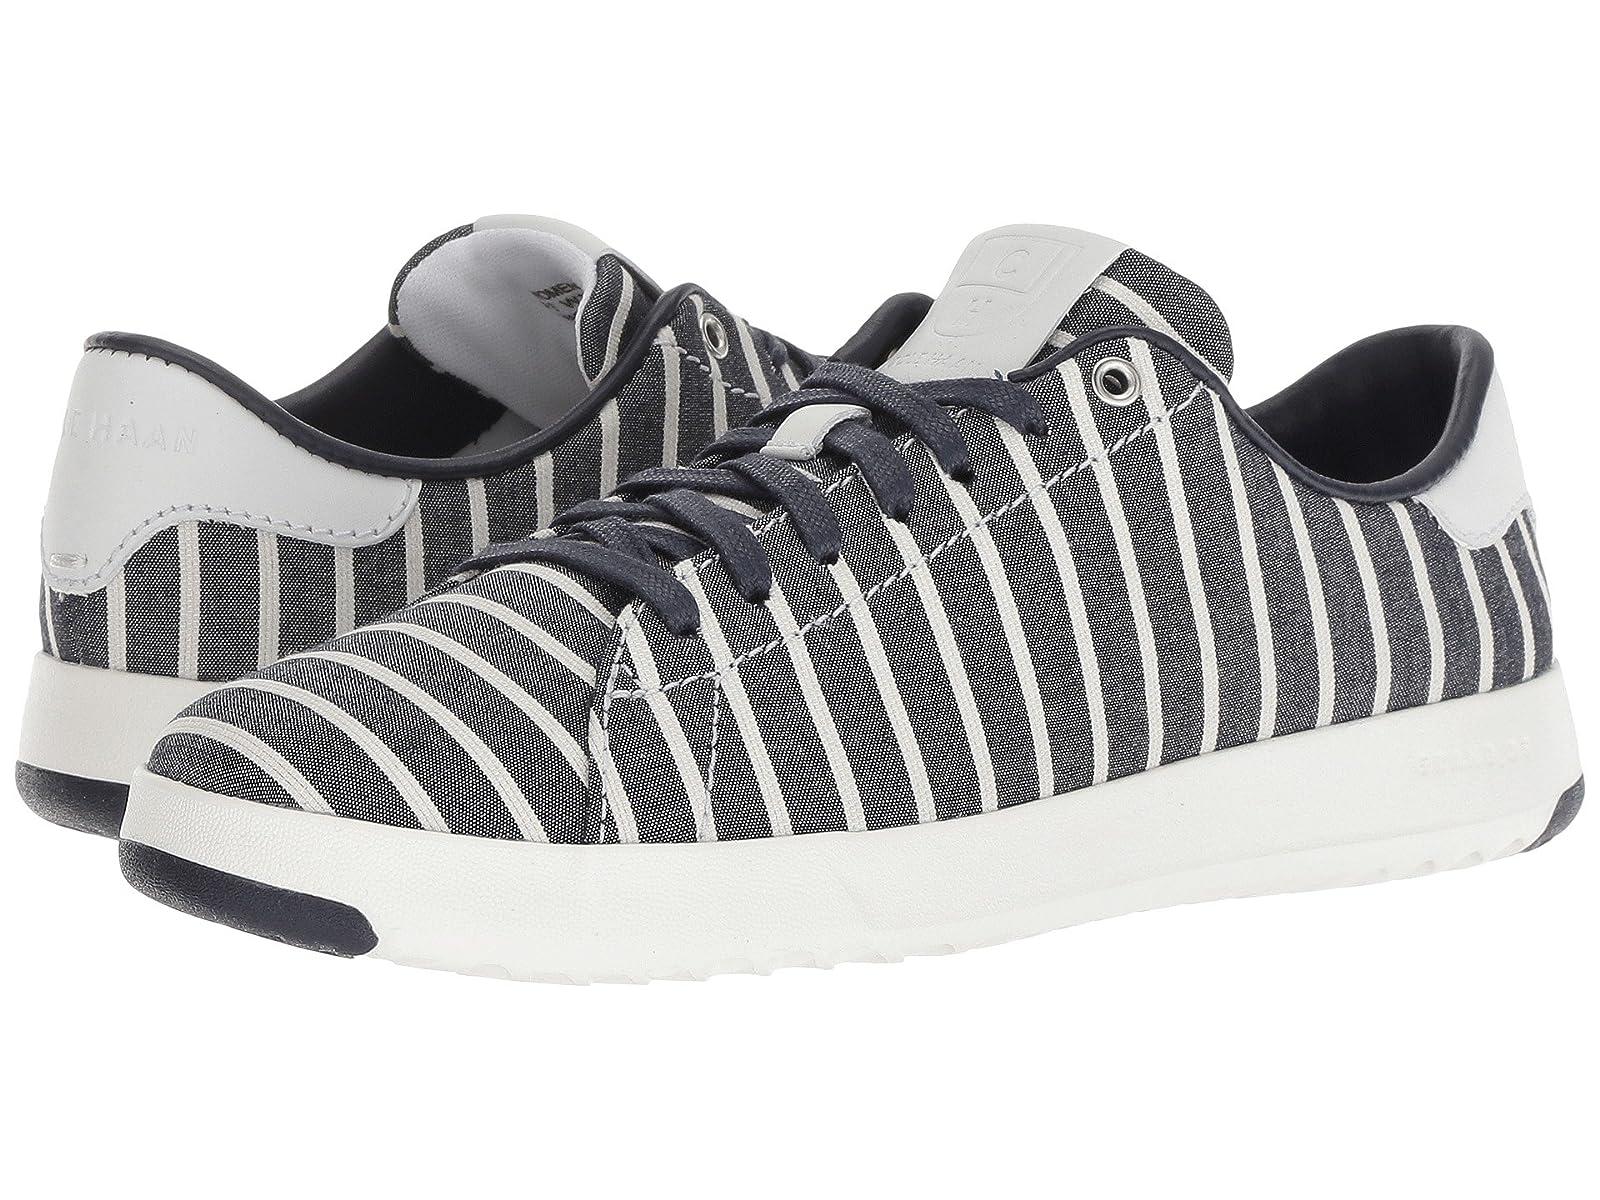 Cole Haan Grandpro TennisAtmospheric grades have affordable shoes